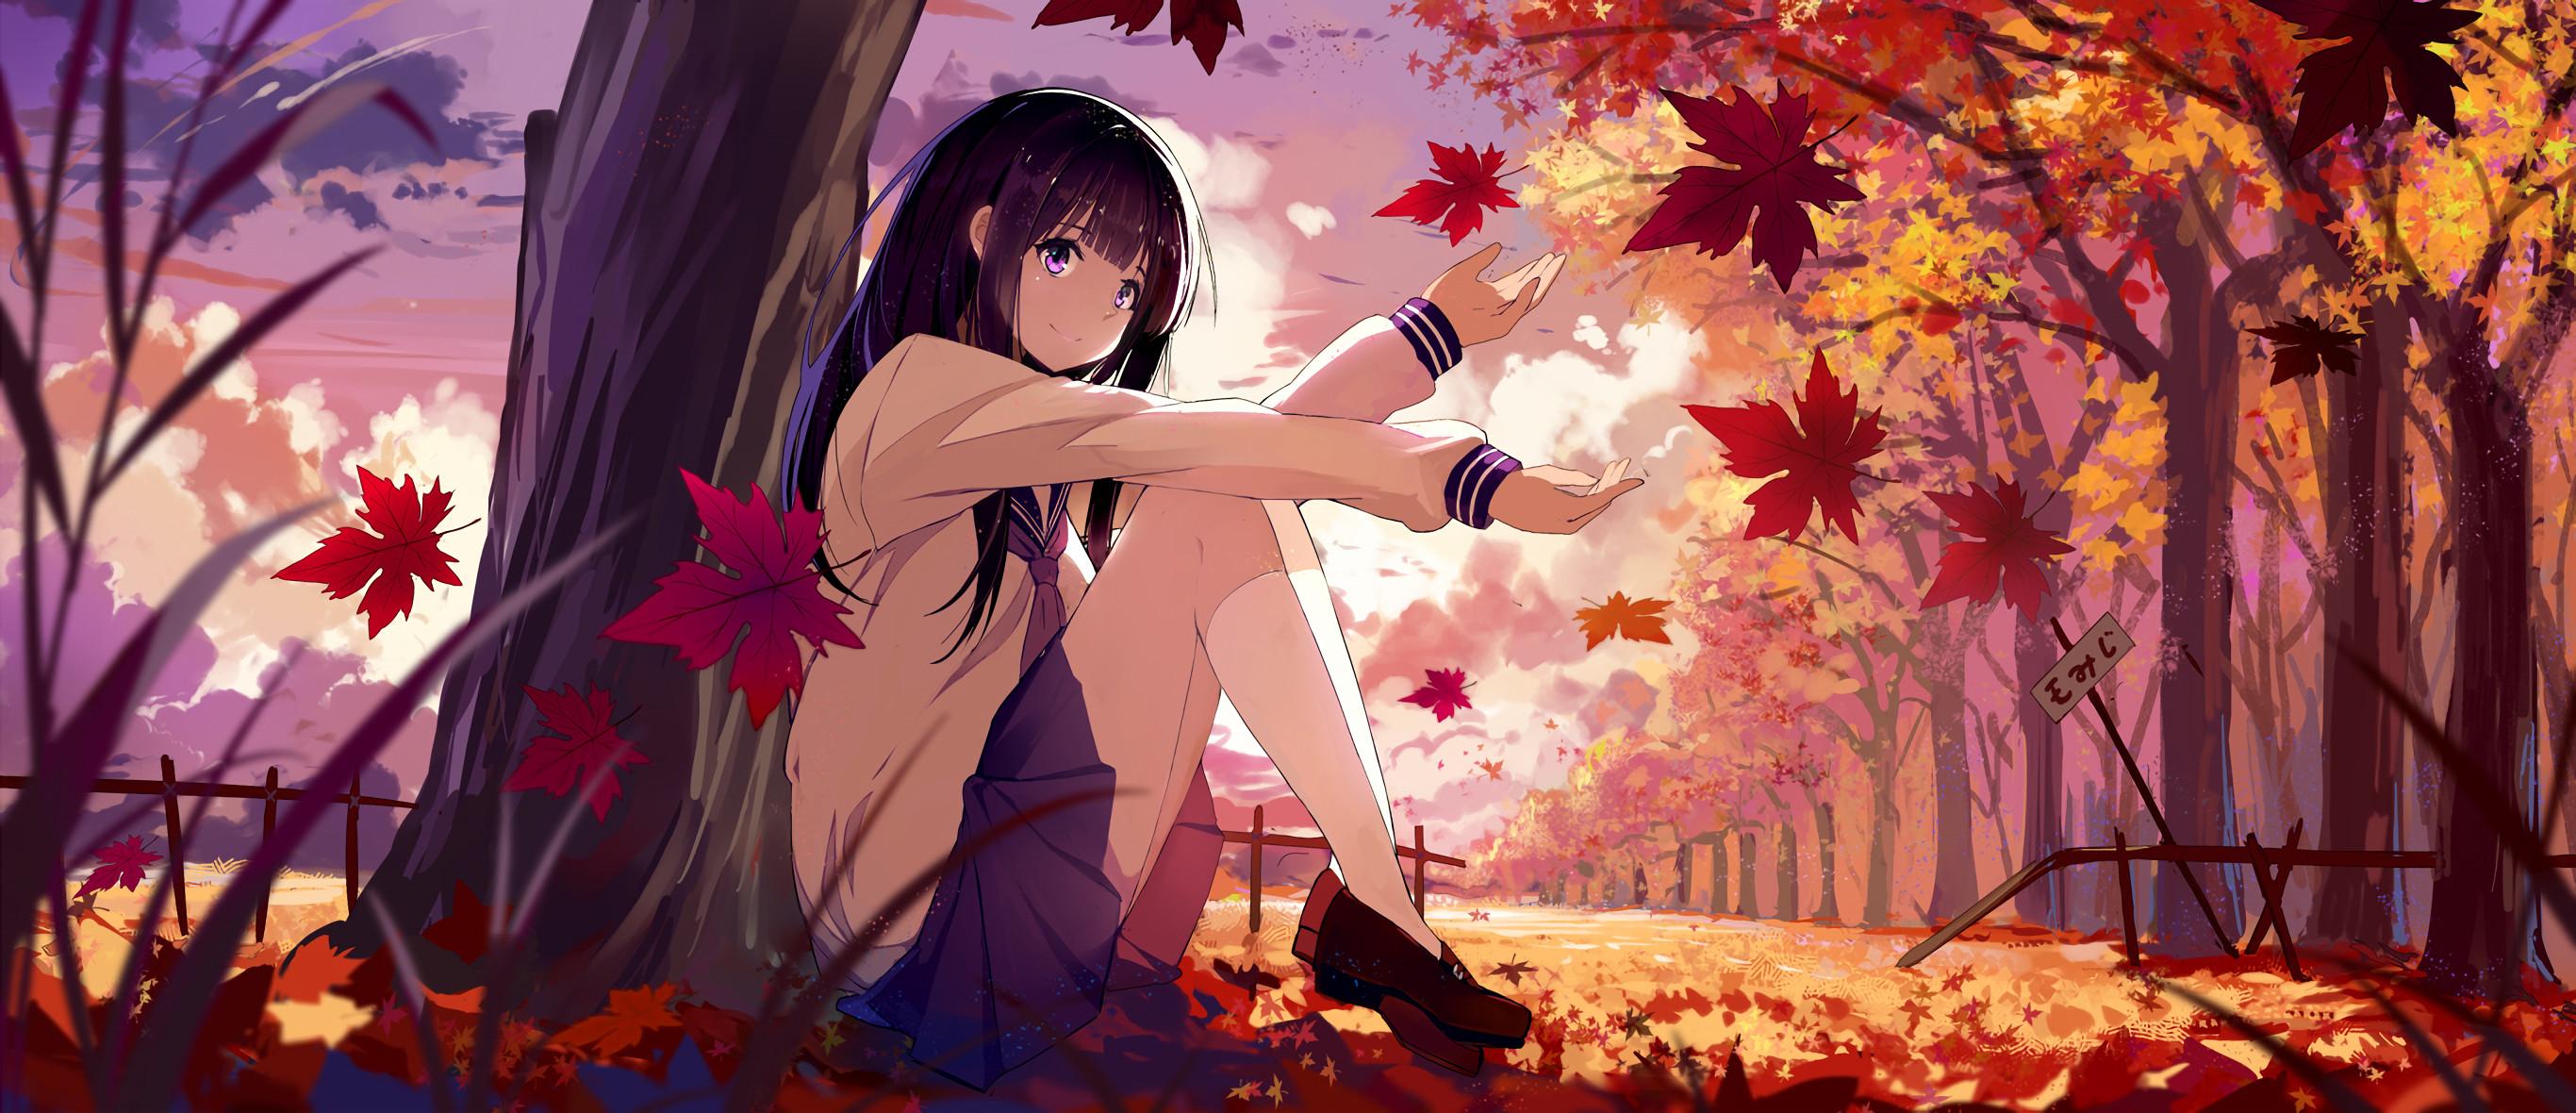 Anime Hyouka Chitanda Eru black hair purple eyes fall leaves